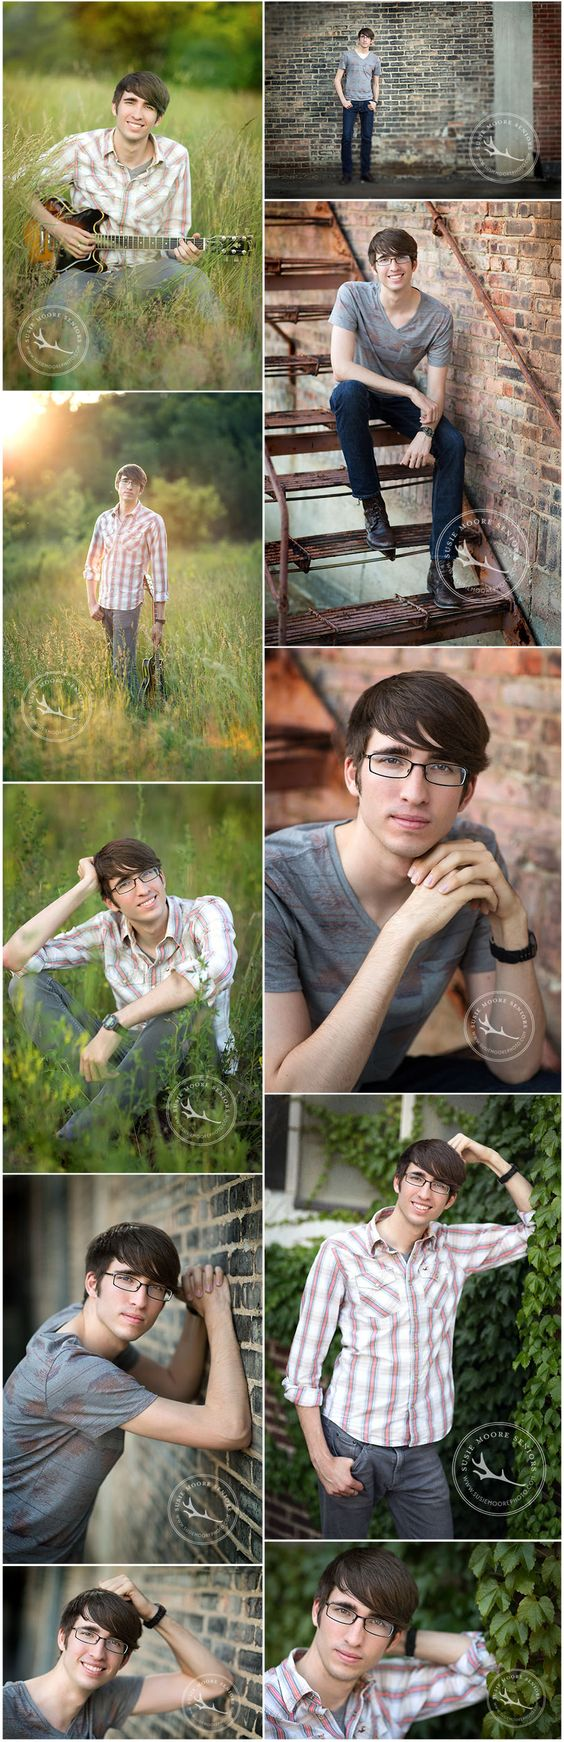 Tyler | University of Illinois | Class of 2013 | Illinois and Indianapolis Senior Photography